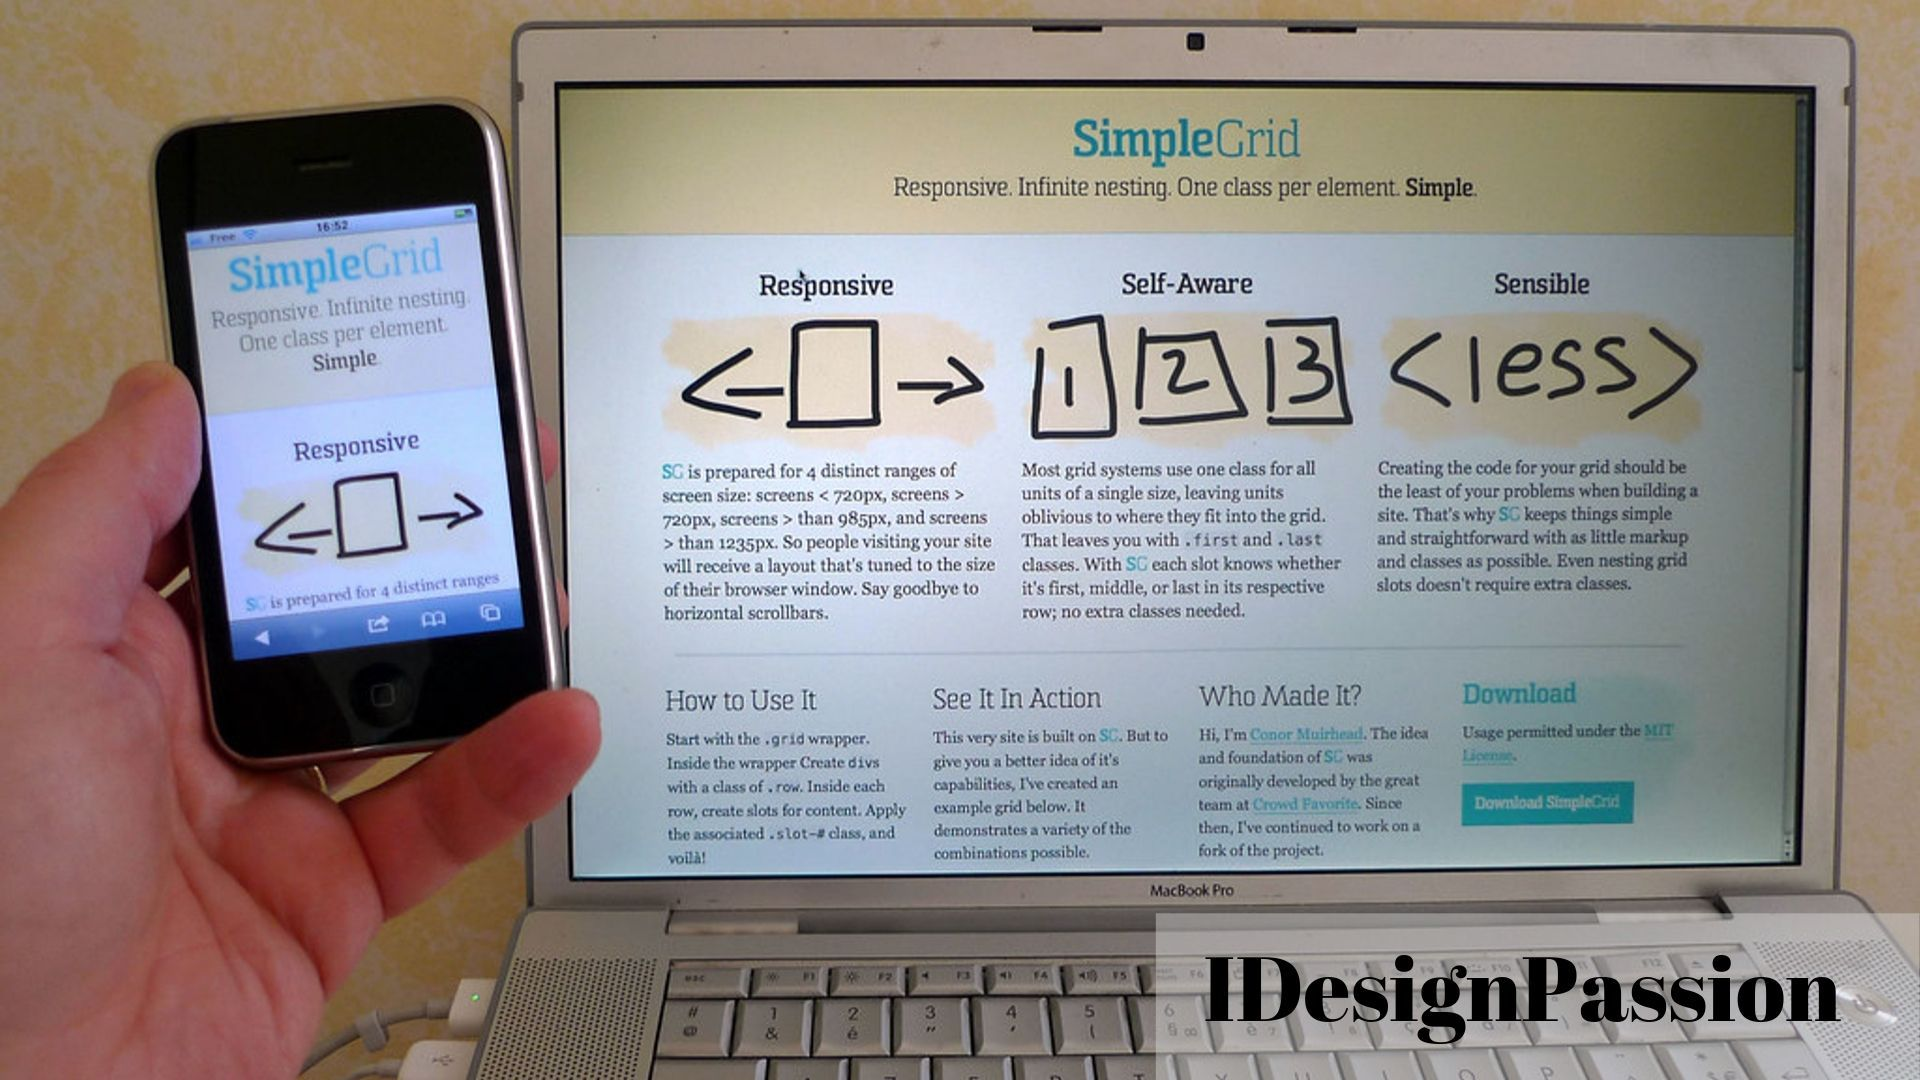 The Best Web Design In Philadelphia Professional Web Design Web Design Company Web Design